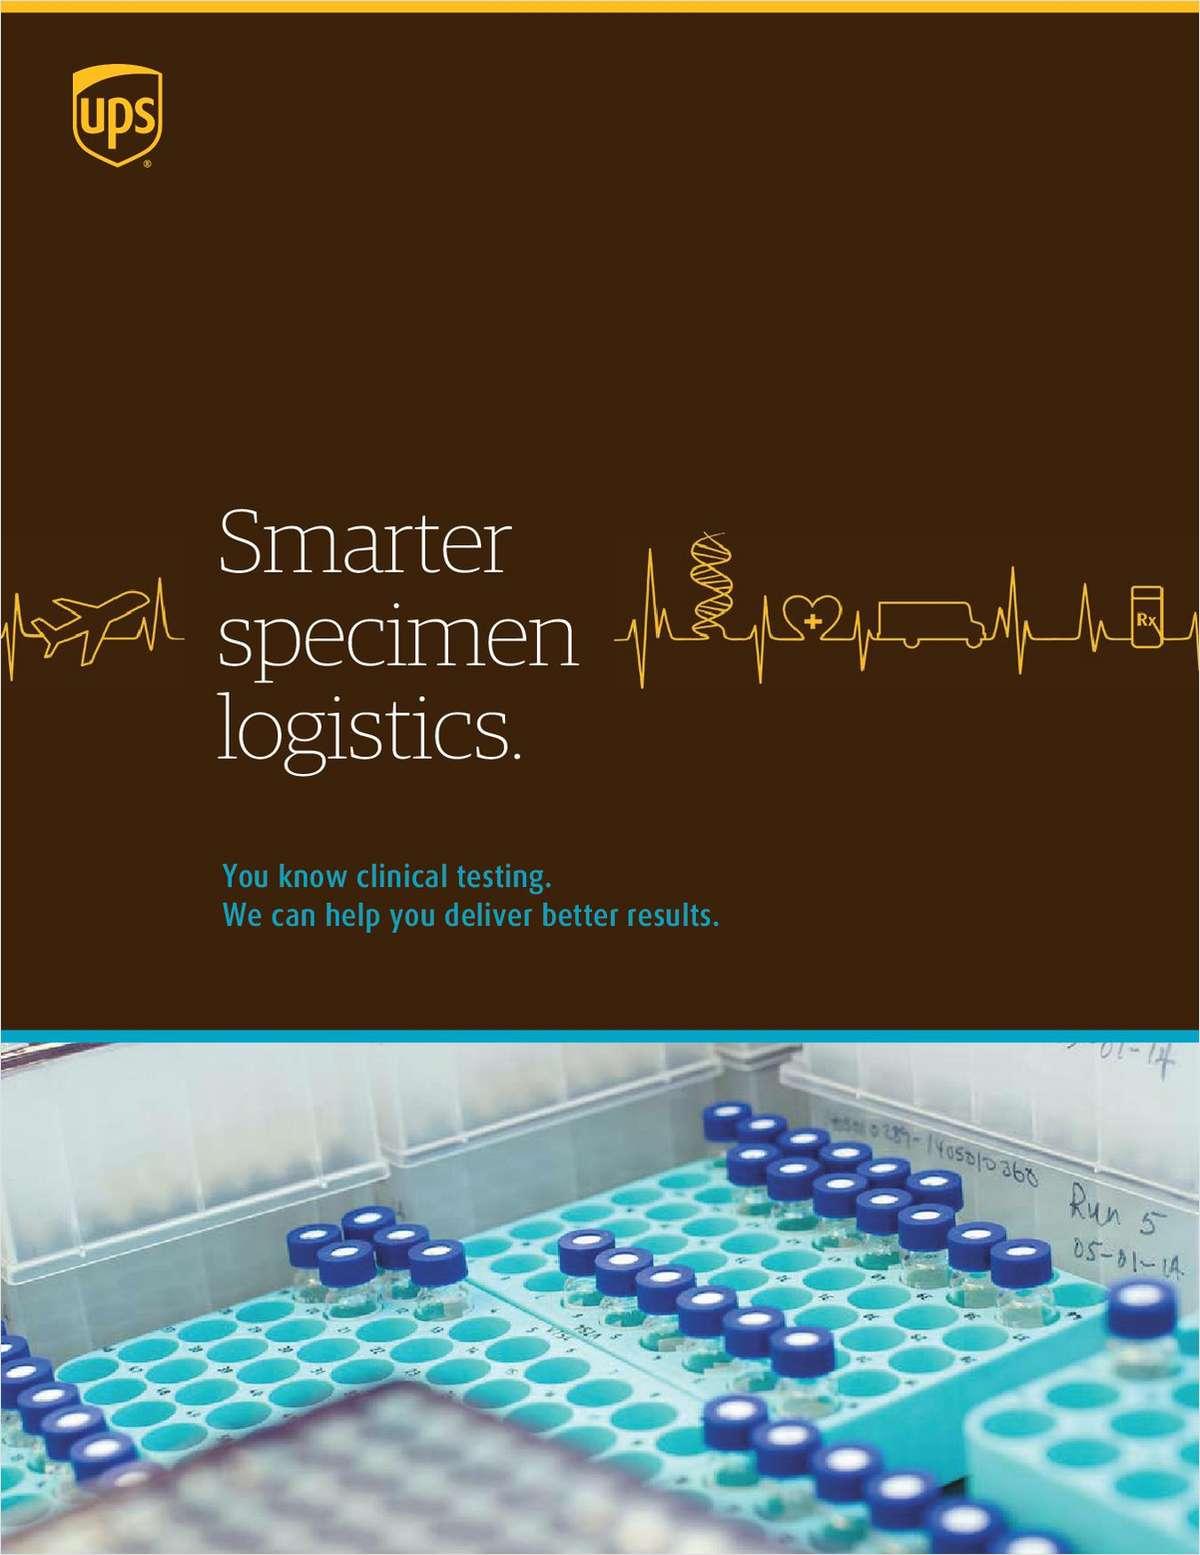 UPS Smarter Specimen Logistics, Free UPS White Paper